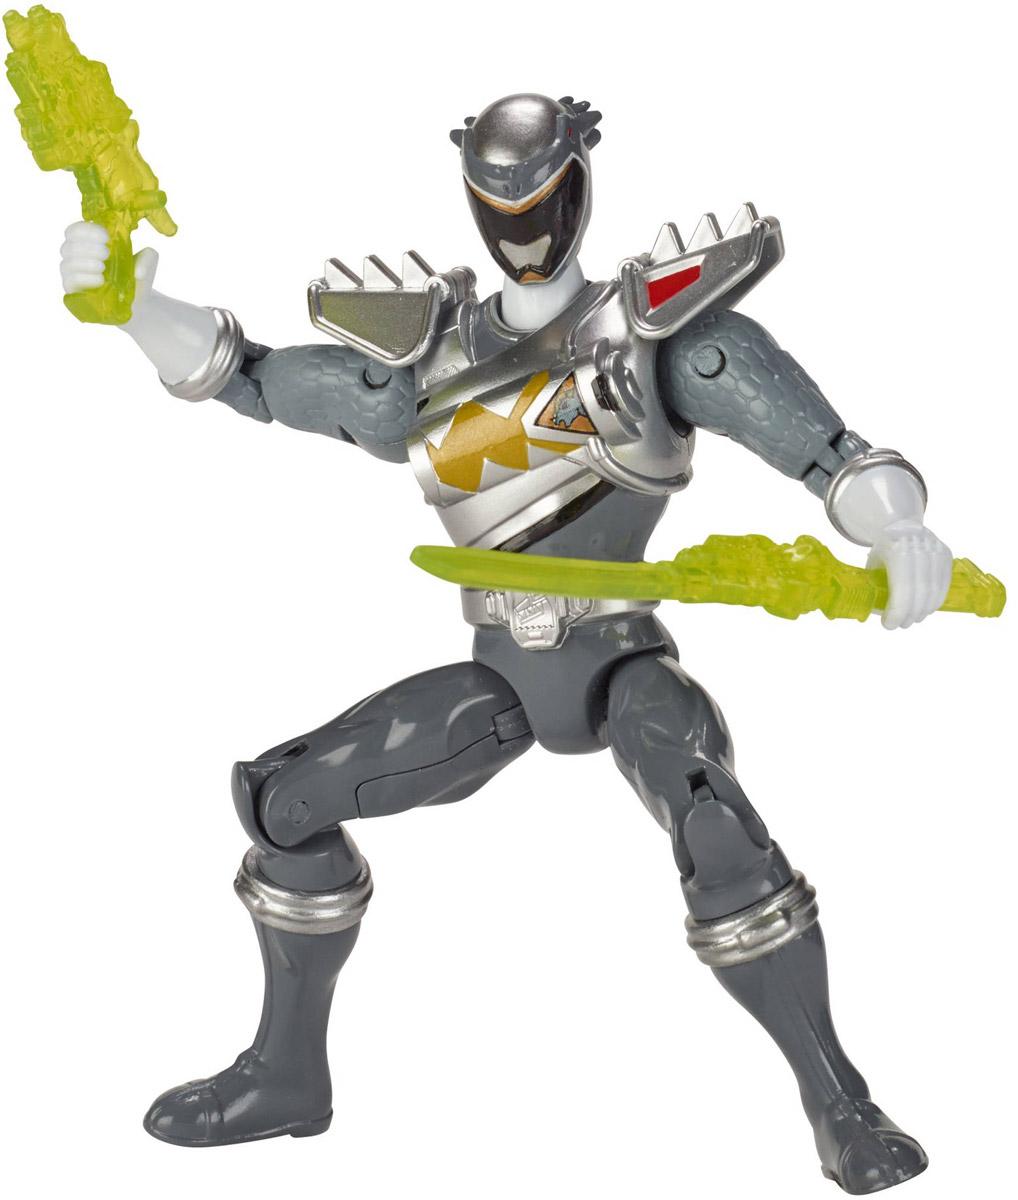 Power Rangers Фигурка Dino Drive Graphite Ranger jada могучие рейнджеры фигурка black ranger